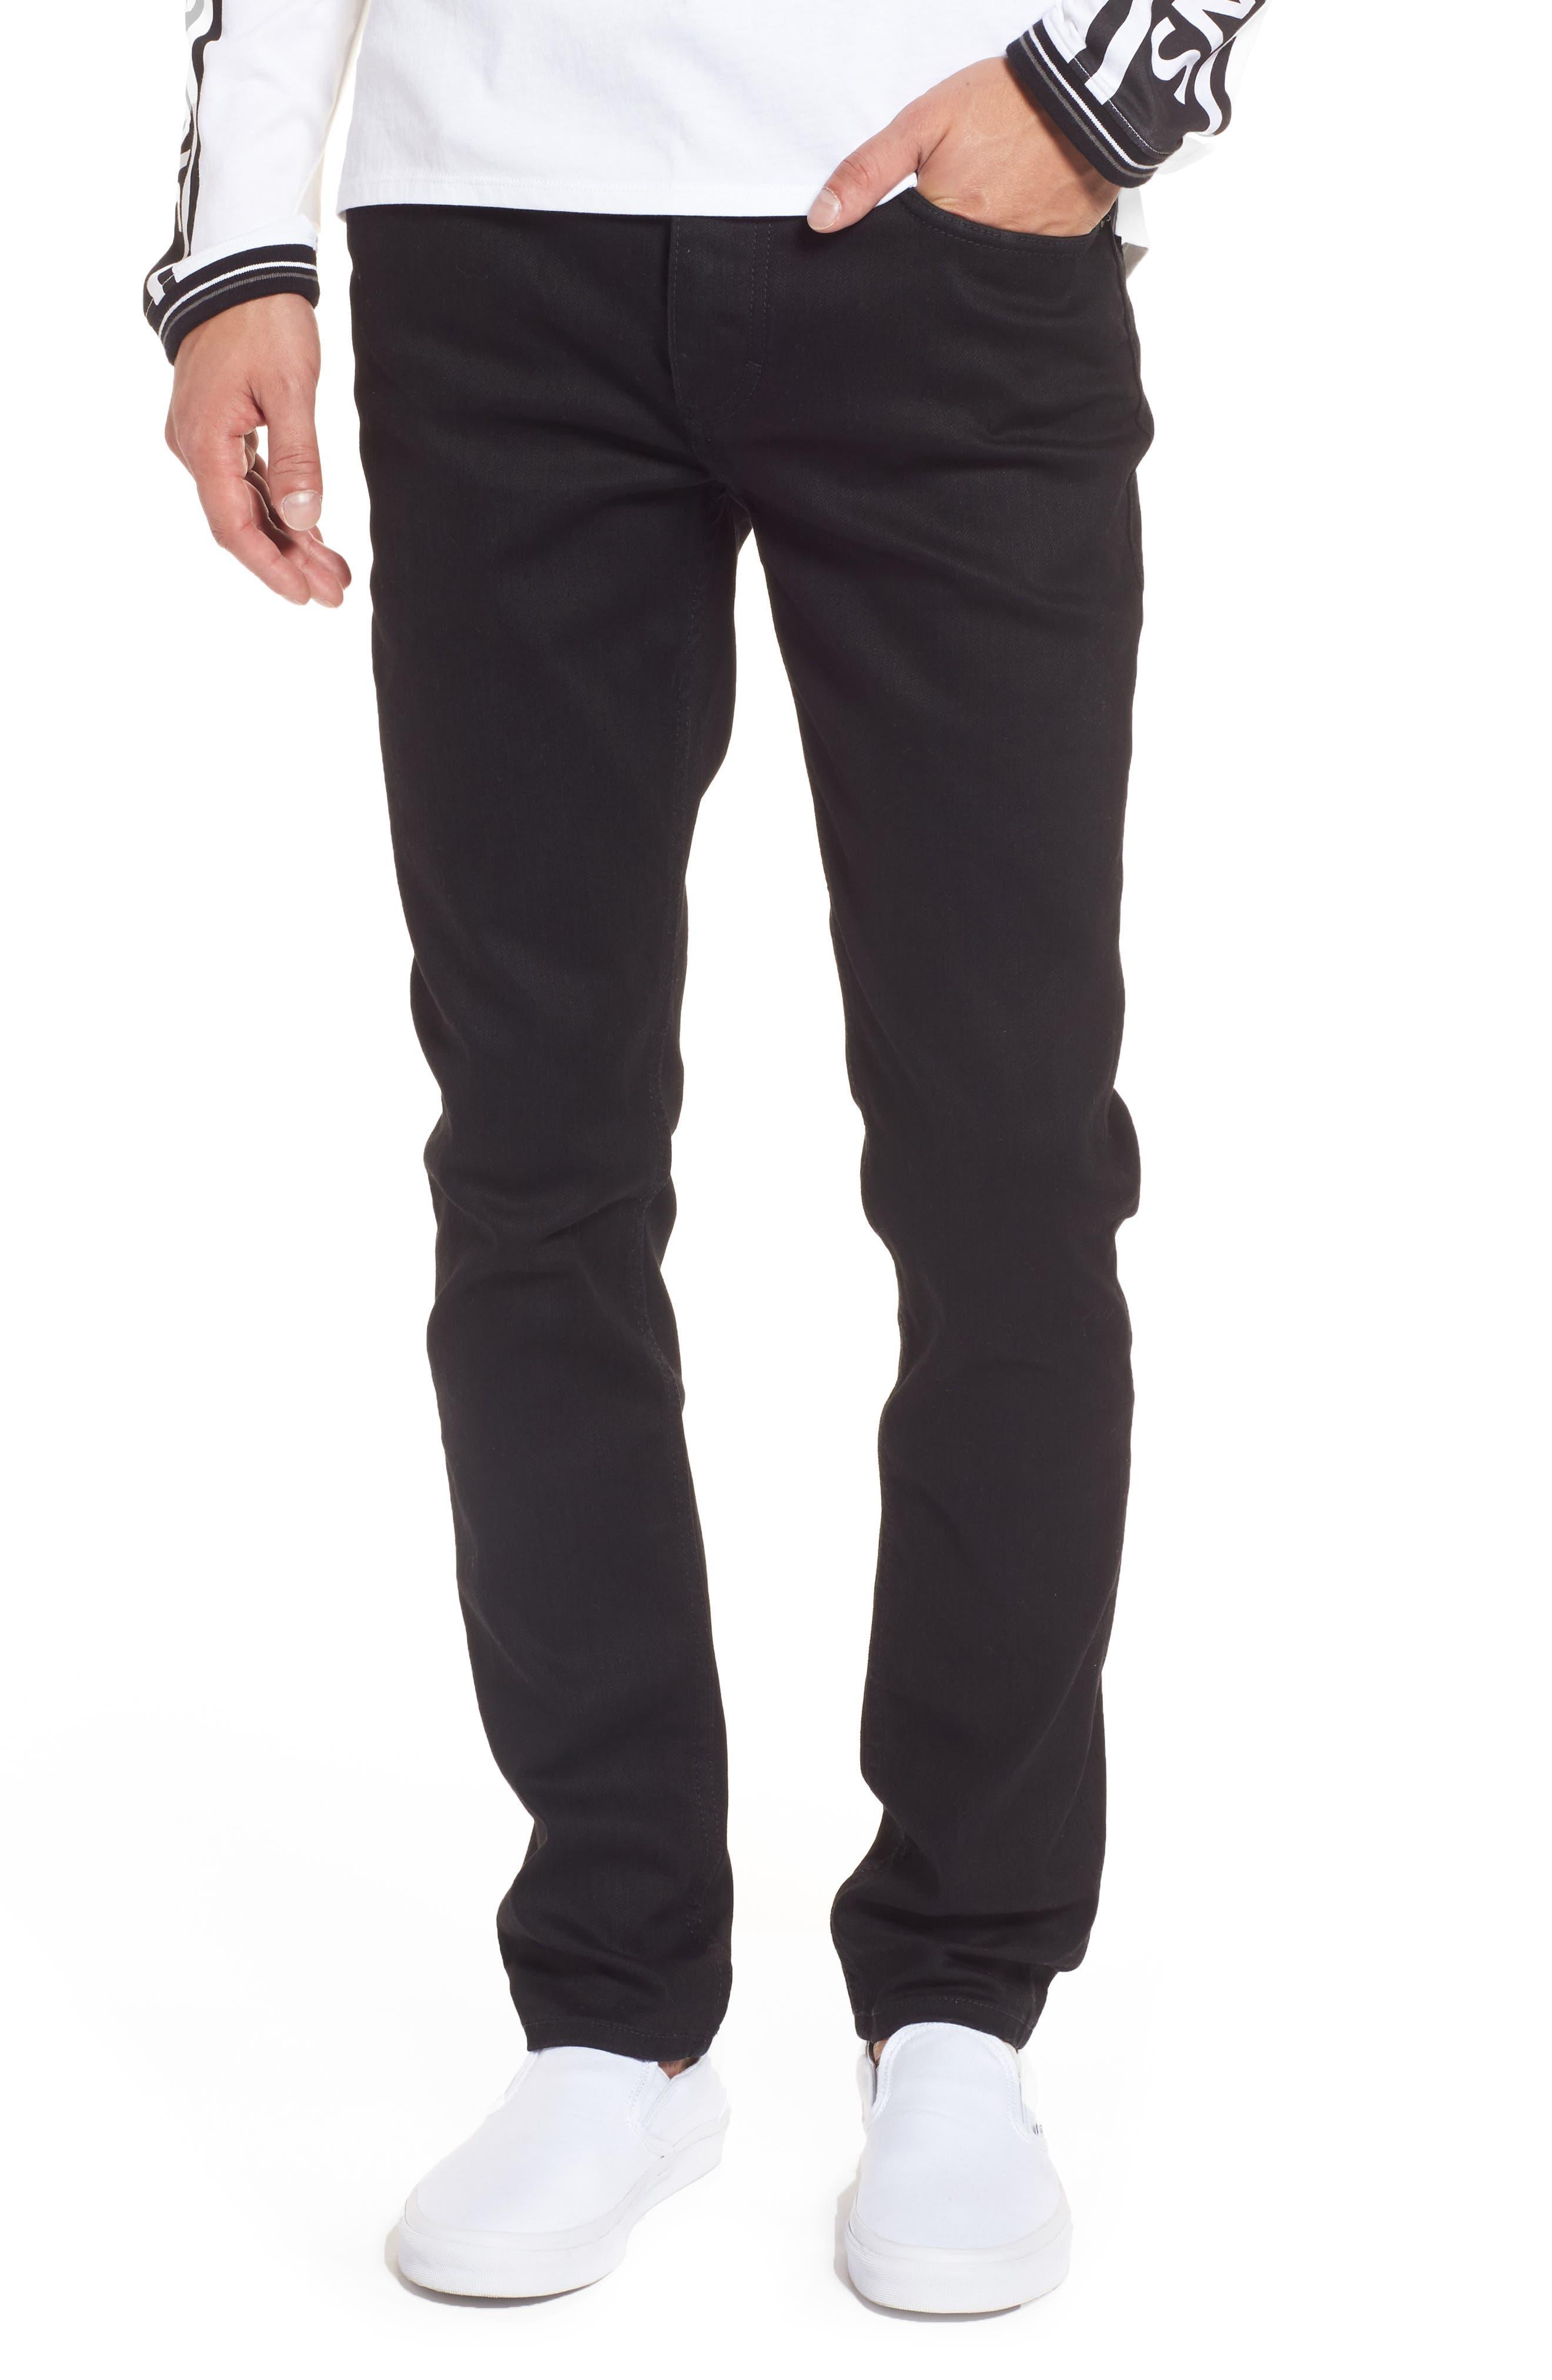 Alternate Image 1 Selected - Calvin Klein Skinny Jeans